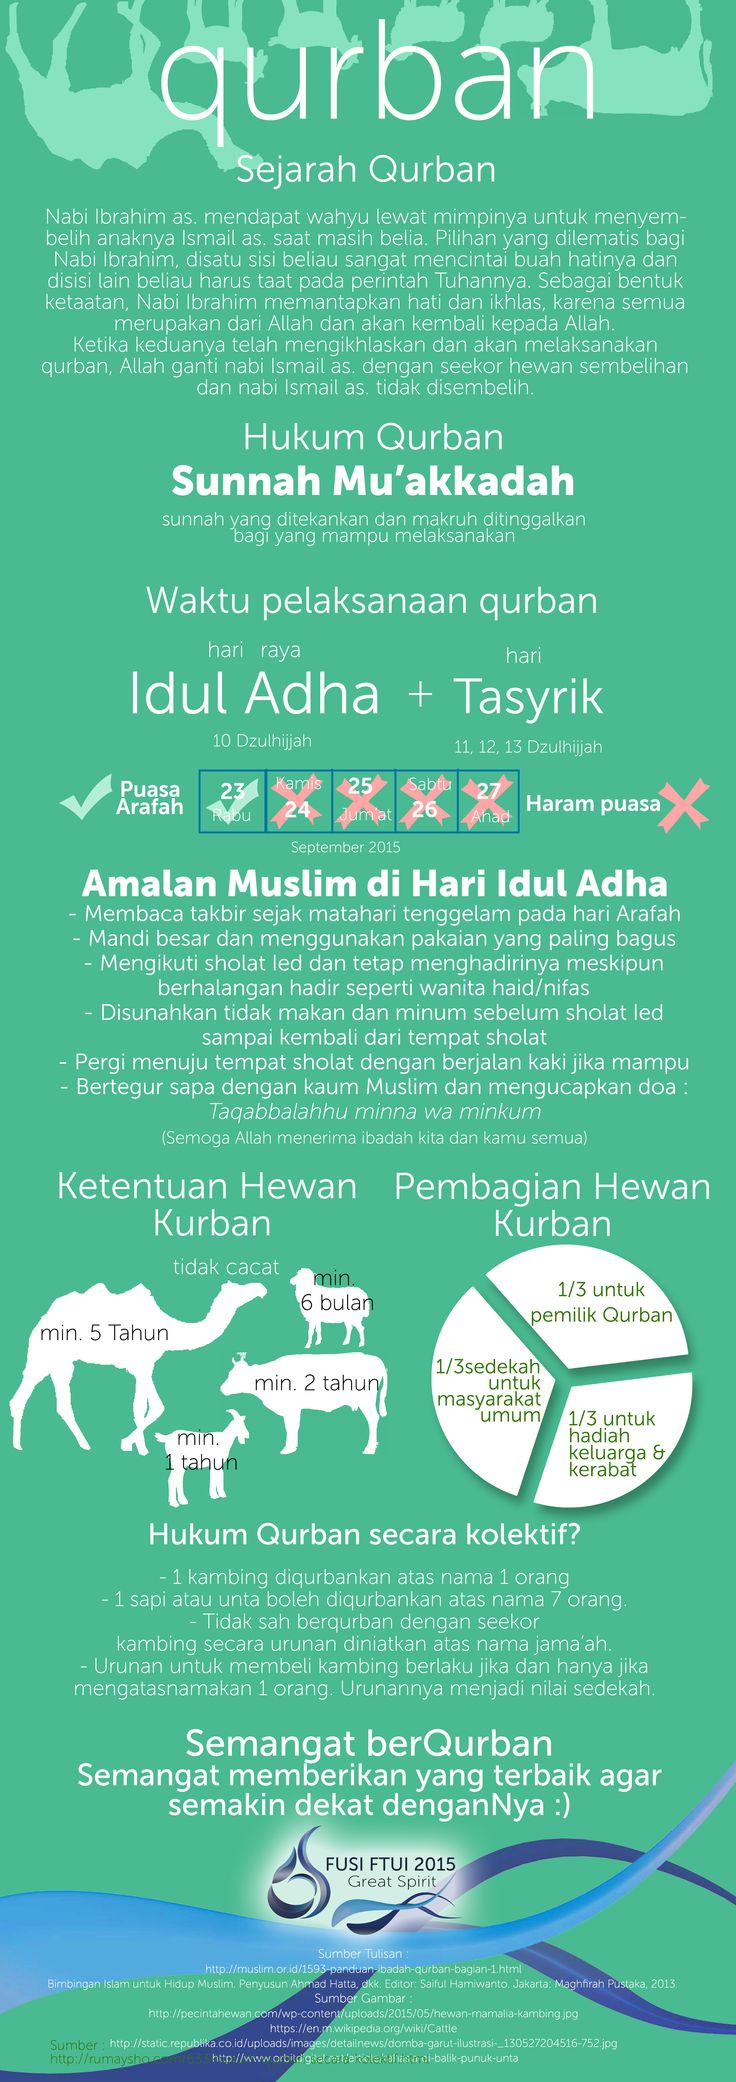 Qurban - Idul Adha